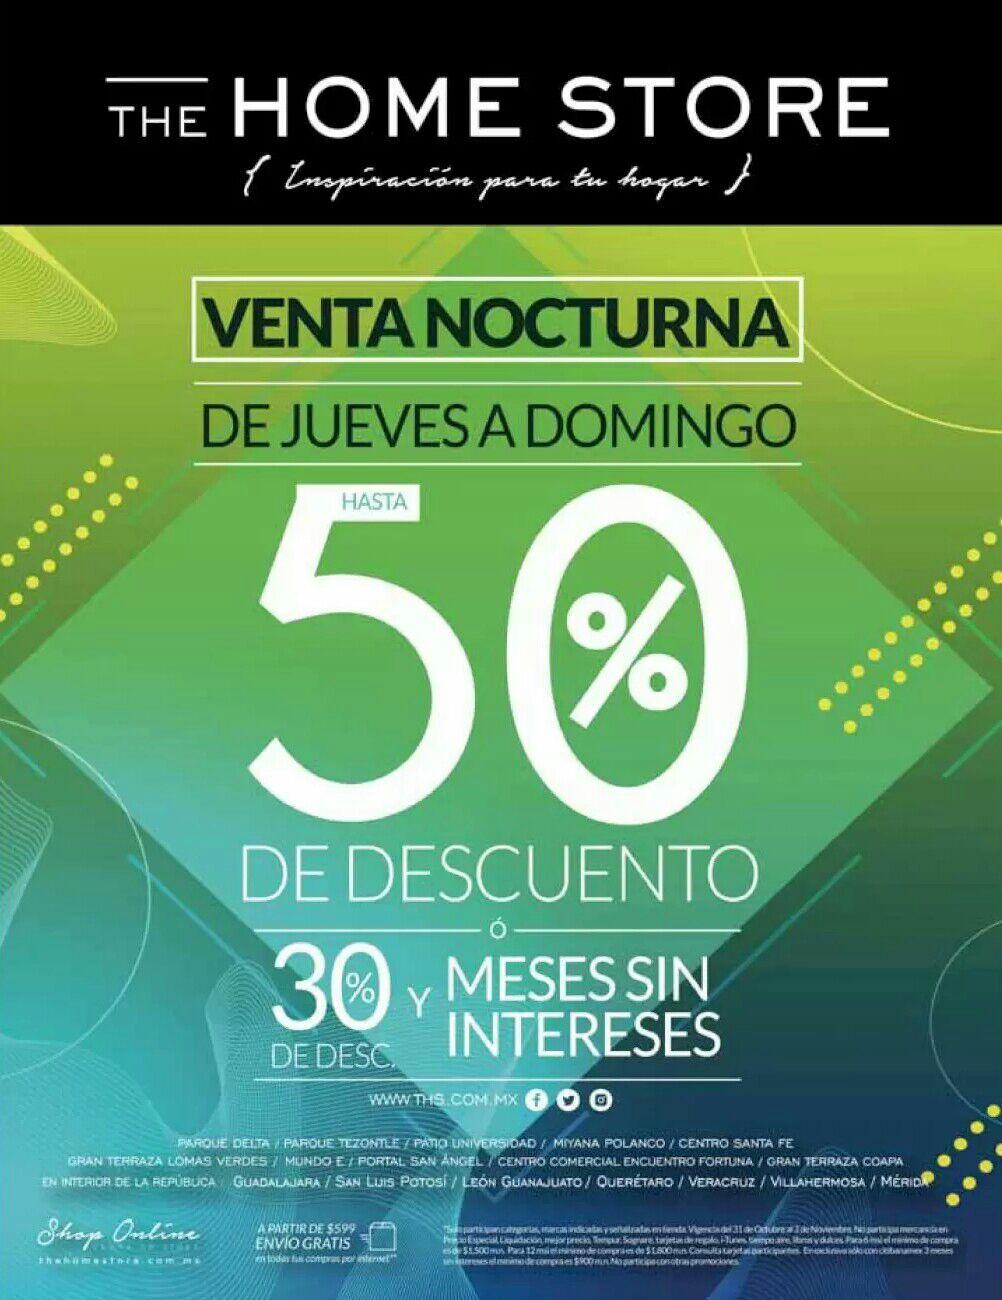 The Home Store: Venta Nocturna: Hasta 50% de descuento... ó... 30% de descuento + MSI